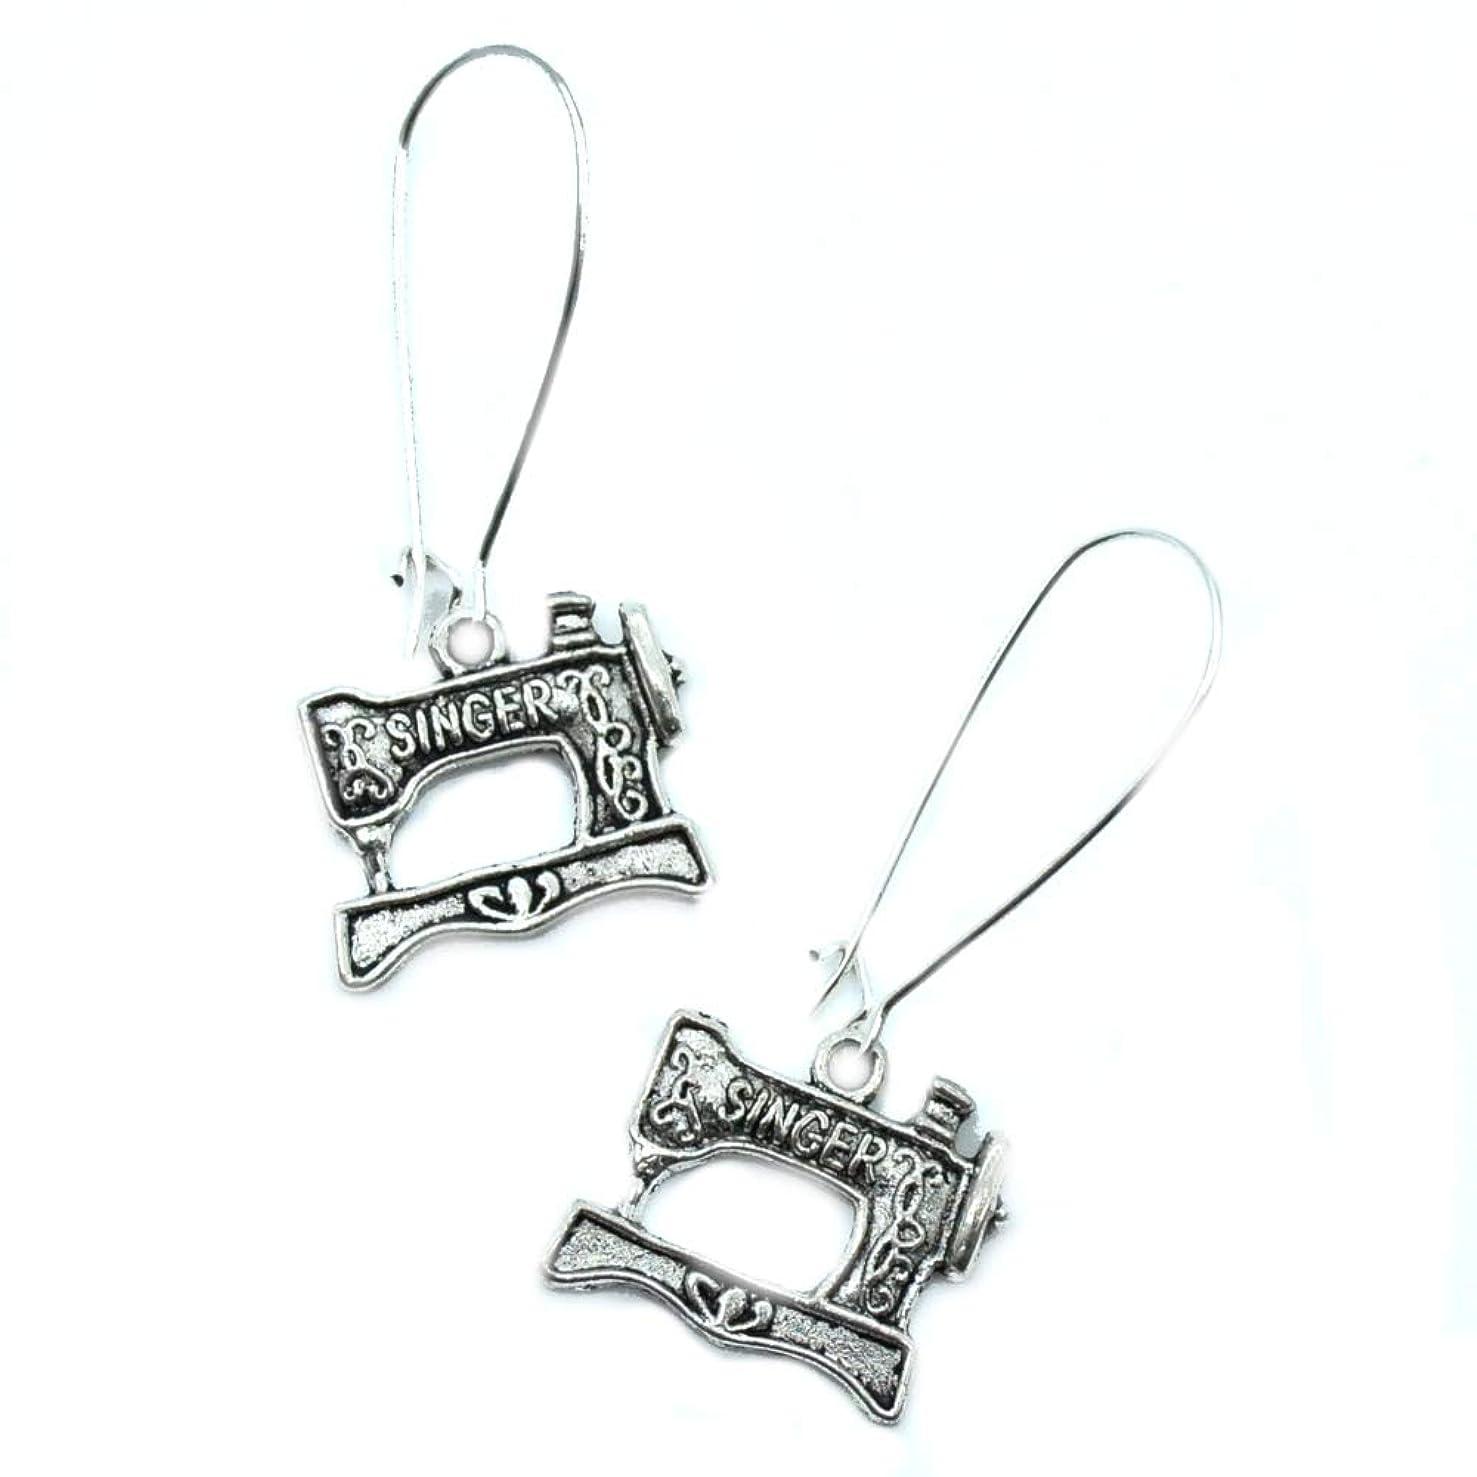 Singer Sewing Machine Silver Charm Earrings